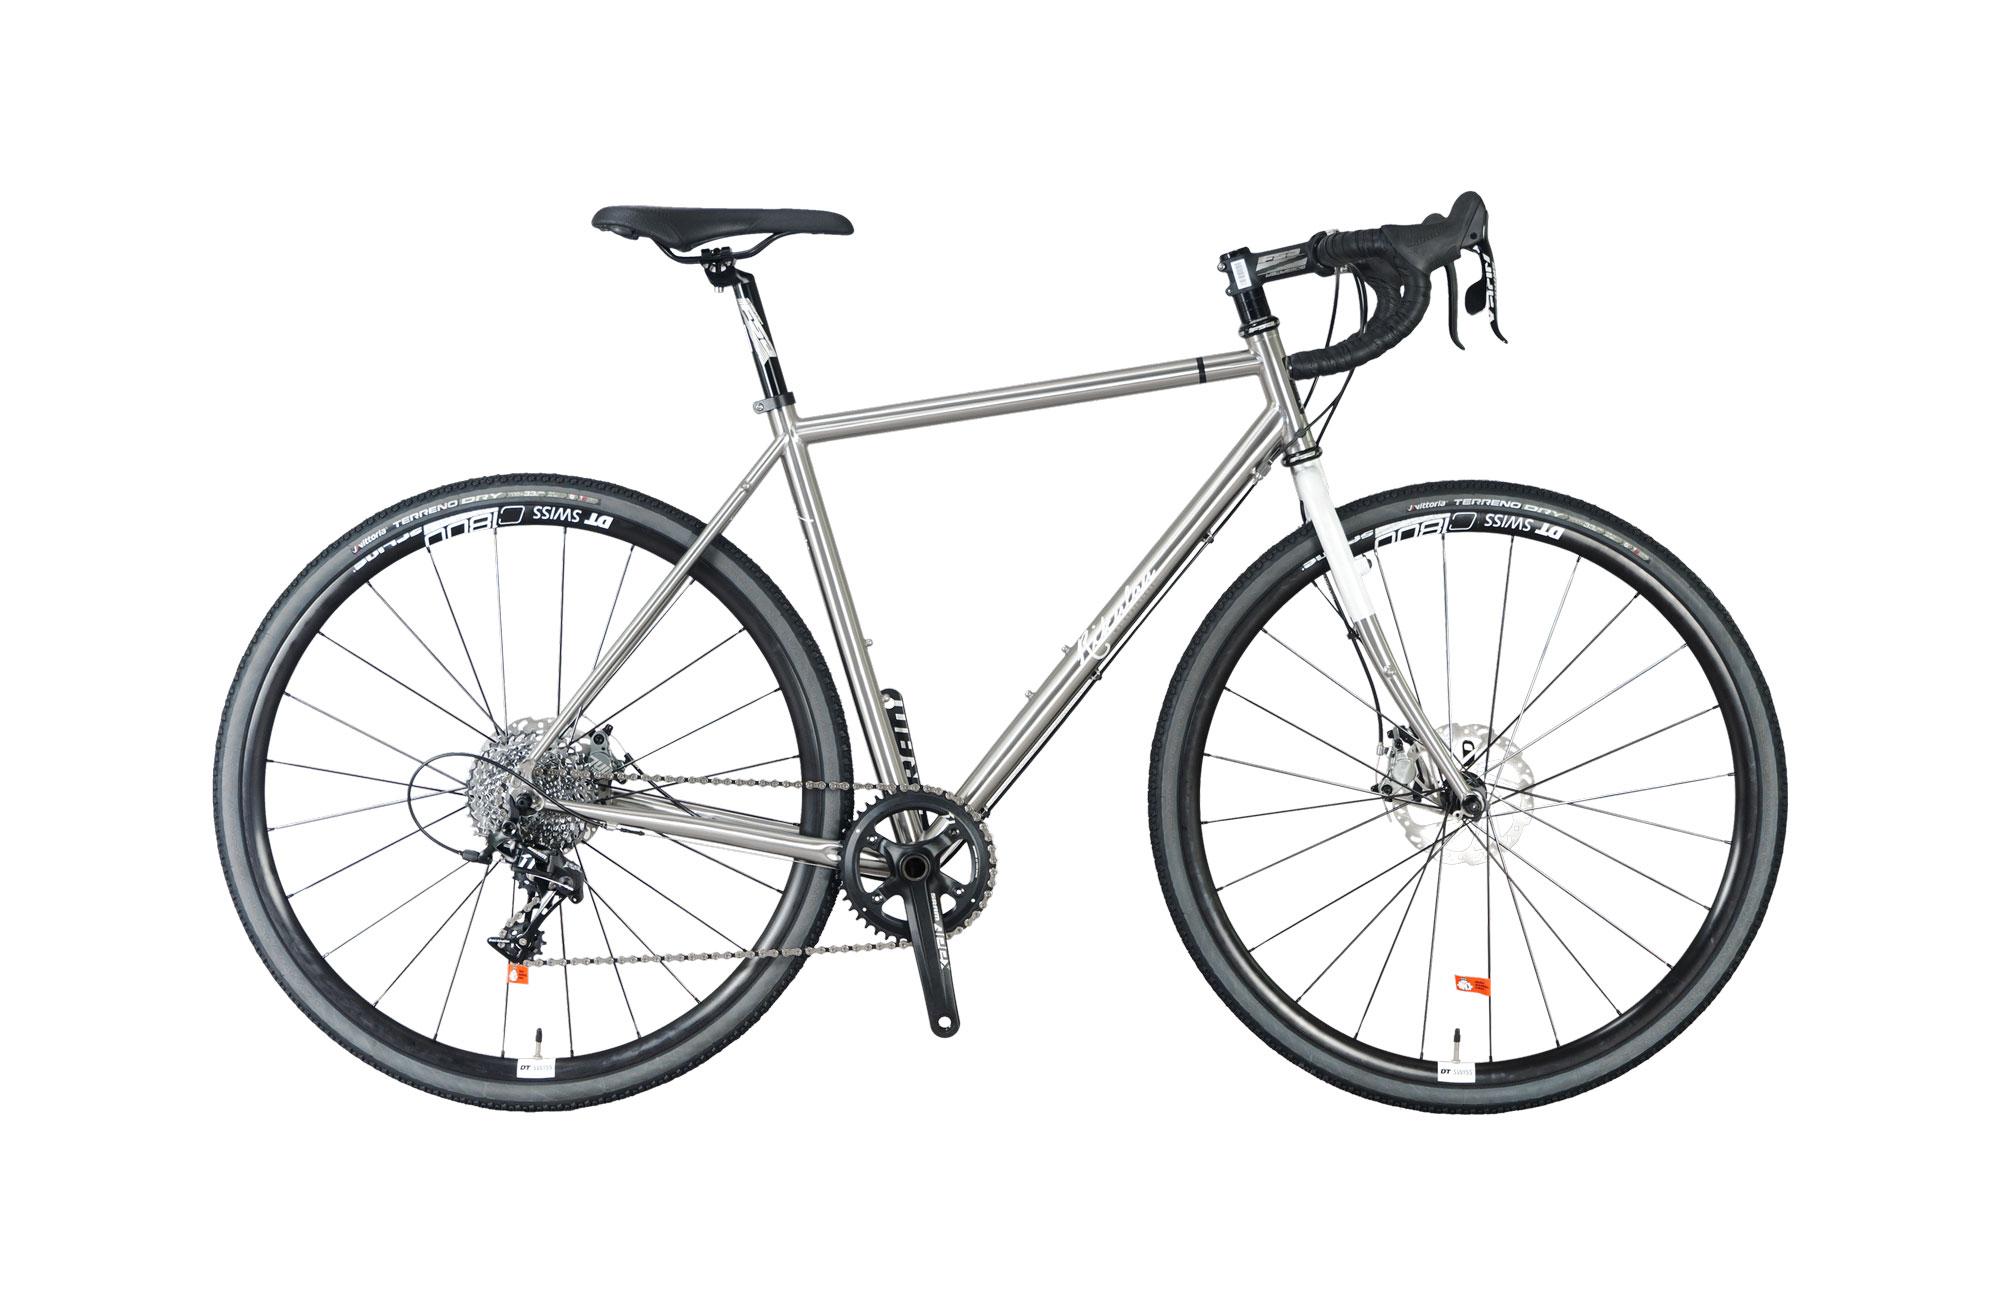 Gravel Bike - Ili Ili M3 (stainless steel)